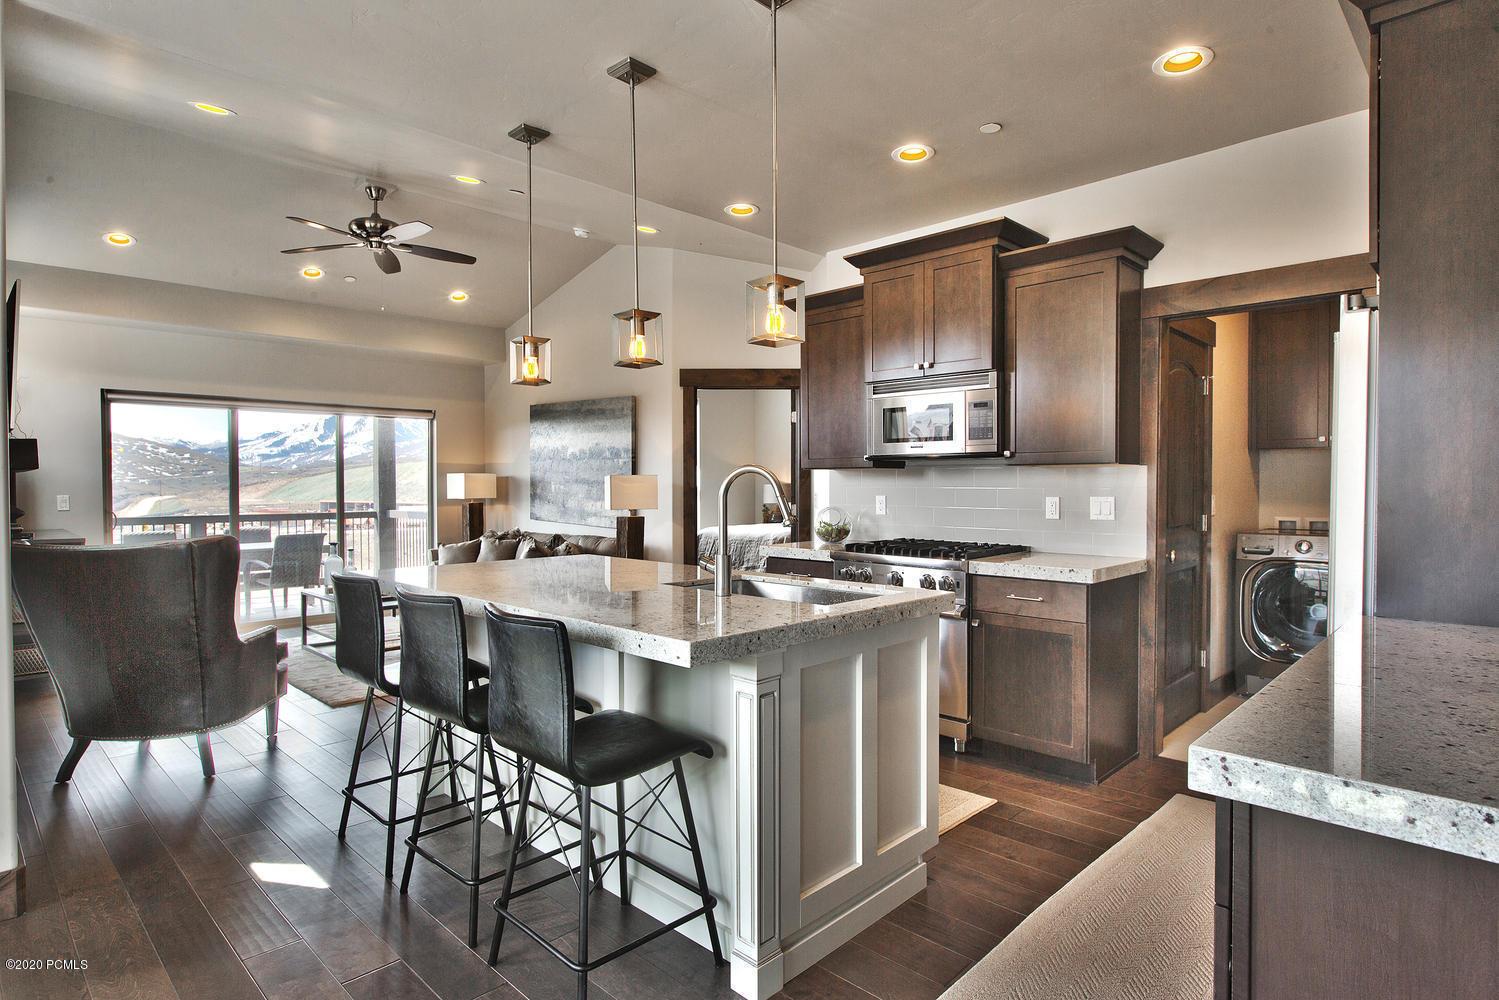 14515 Bronte Court, Heber City, Utah 84032, 3 Bedrooms Bedrooms, ,4 BathroomsBathrooms,Condominium,For Sale,Bronte,12002996